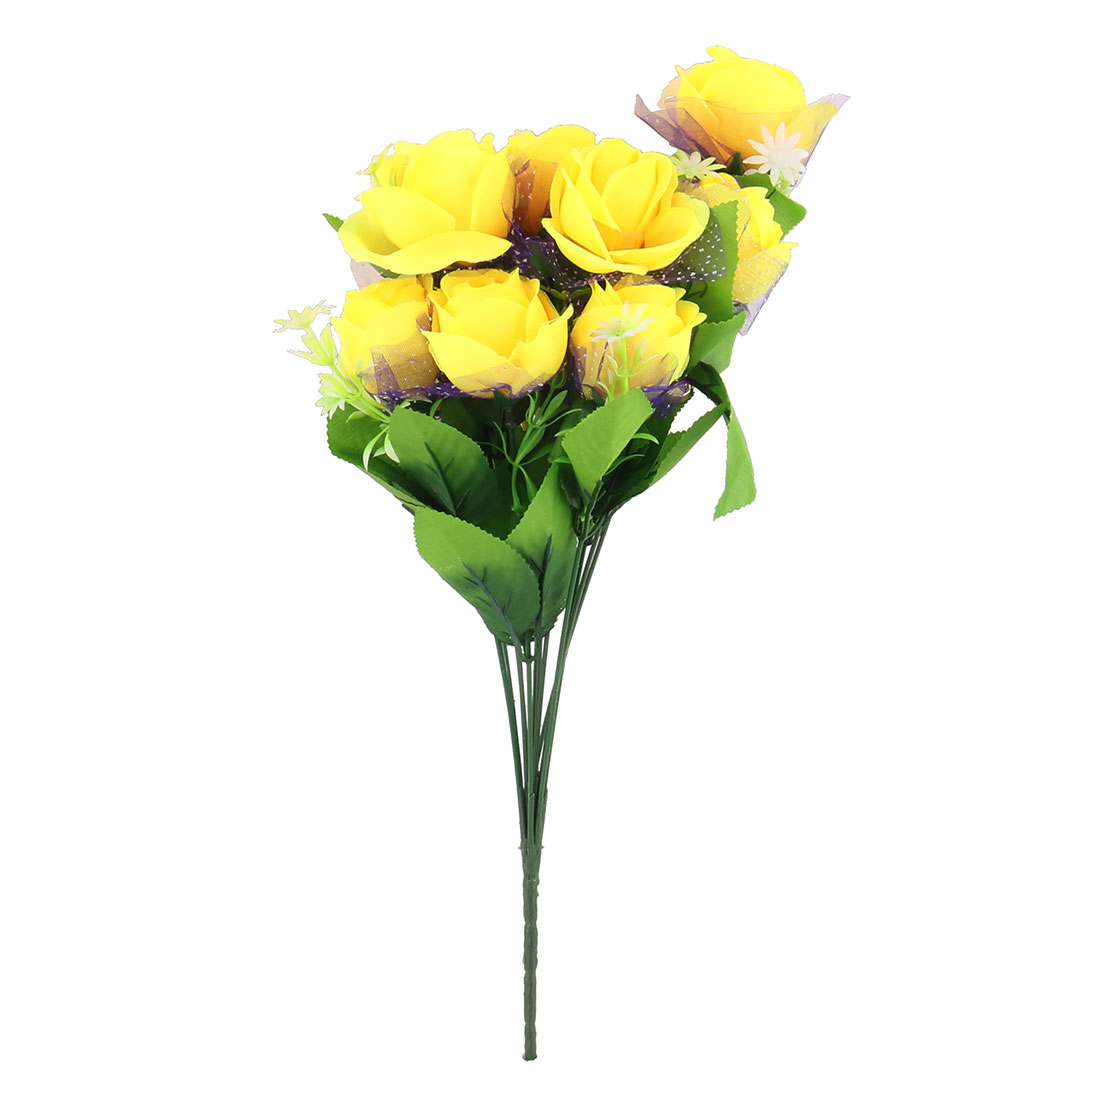 Wedding Restaurant Party Decor Rose Artificial Flower Bouquet Bunch Yellow